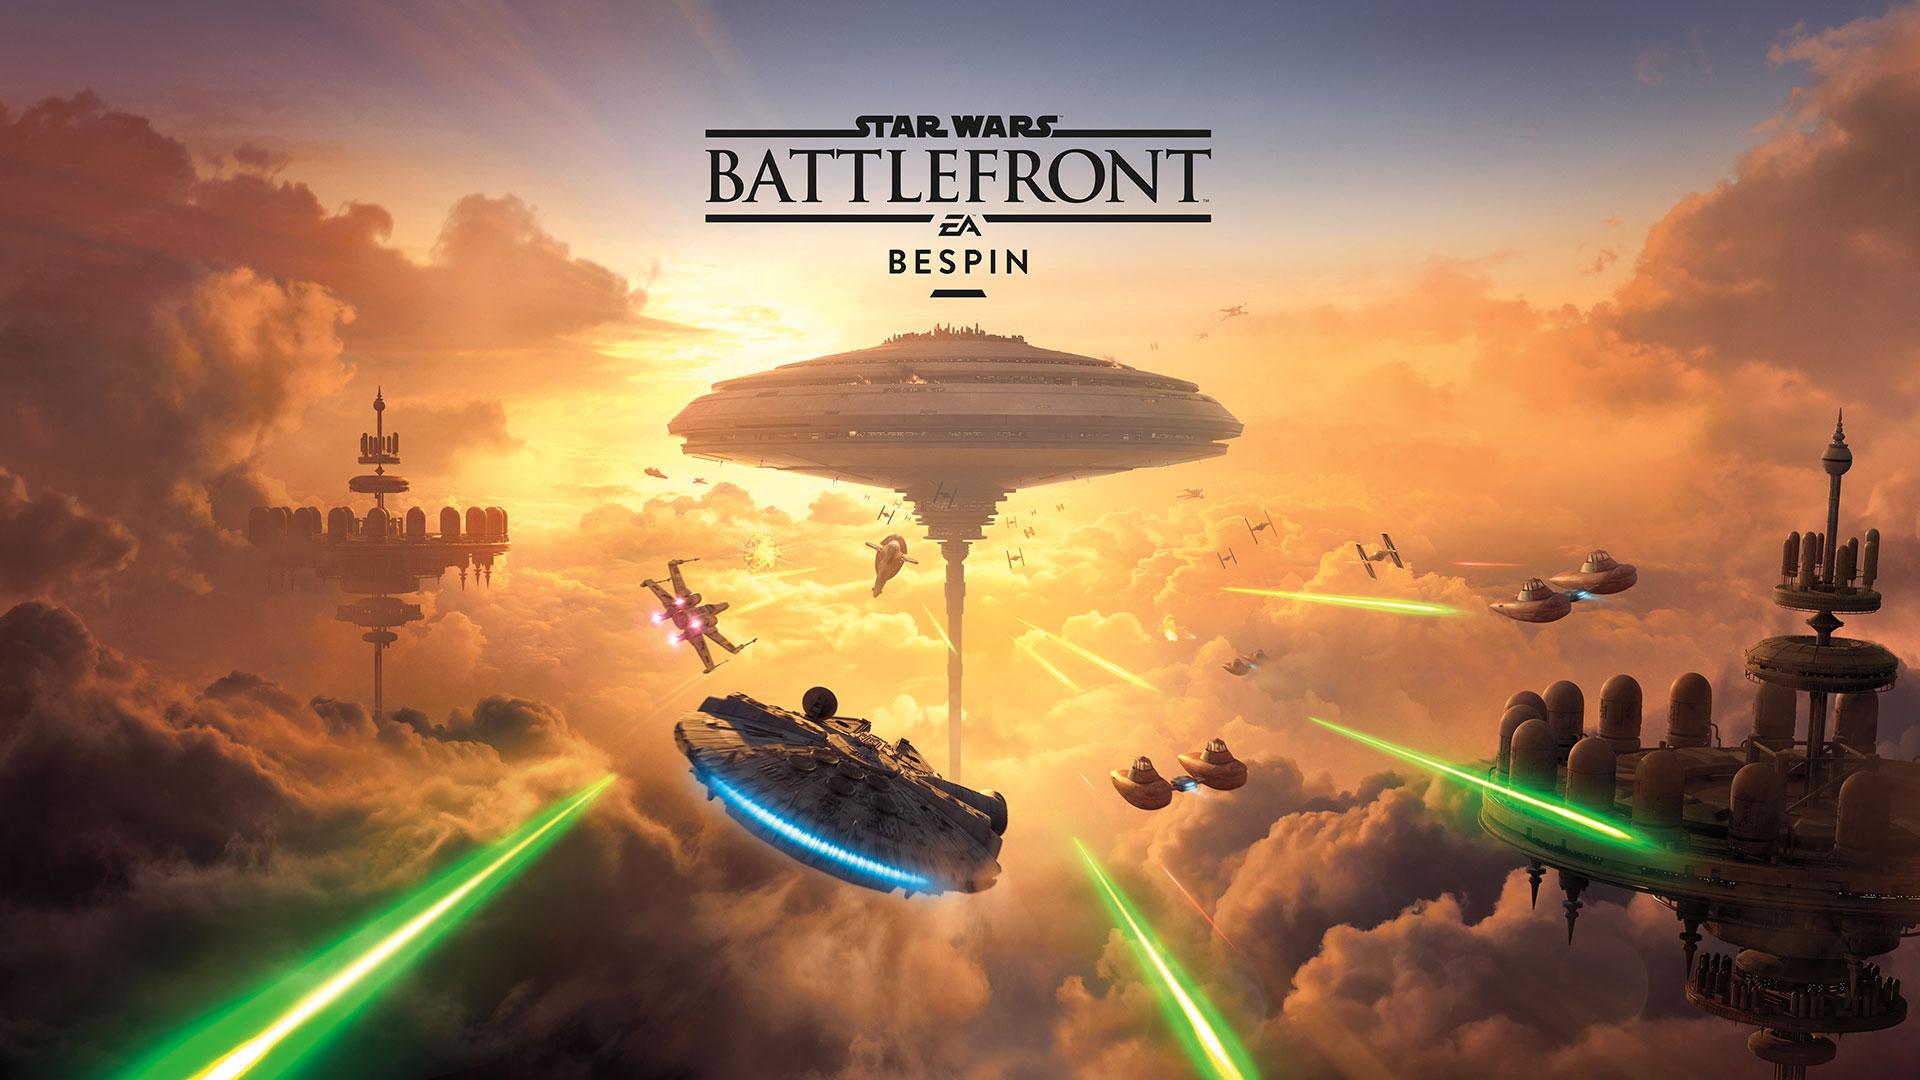 Star Wars Battlefront 'Bespin' DLC Launch Trailer